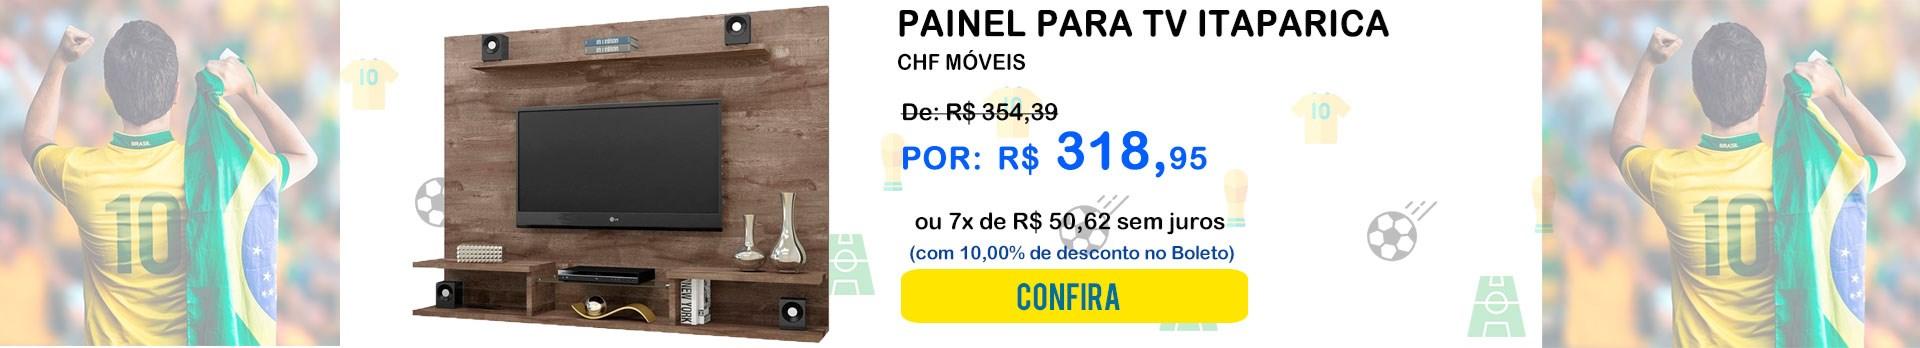 Painel Para TV Itaparica - CHF